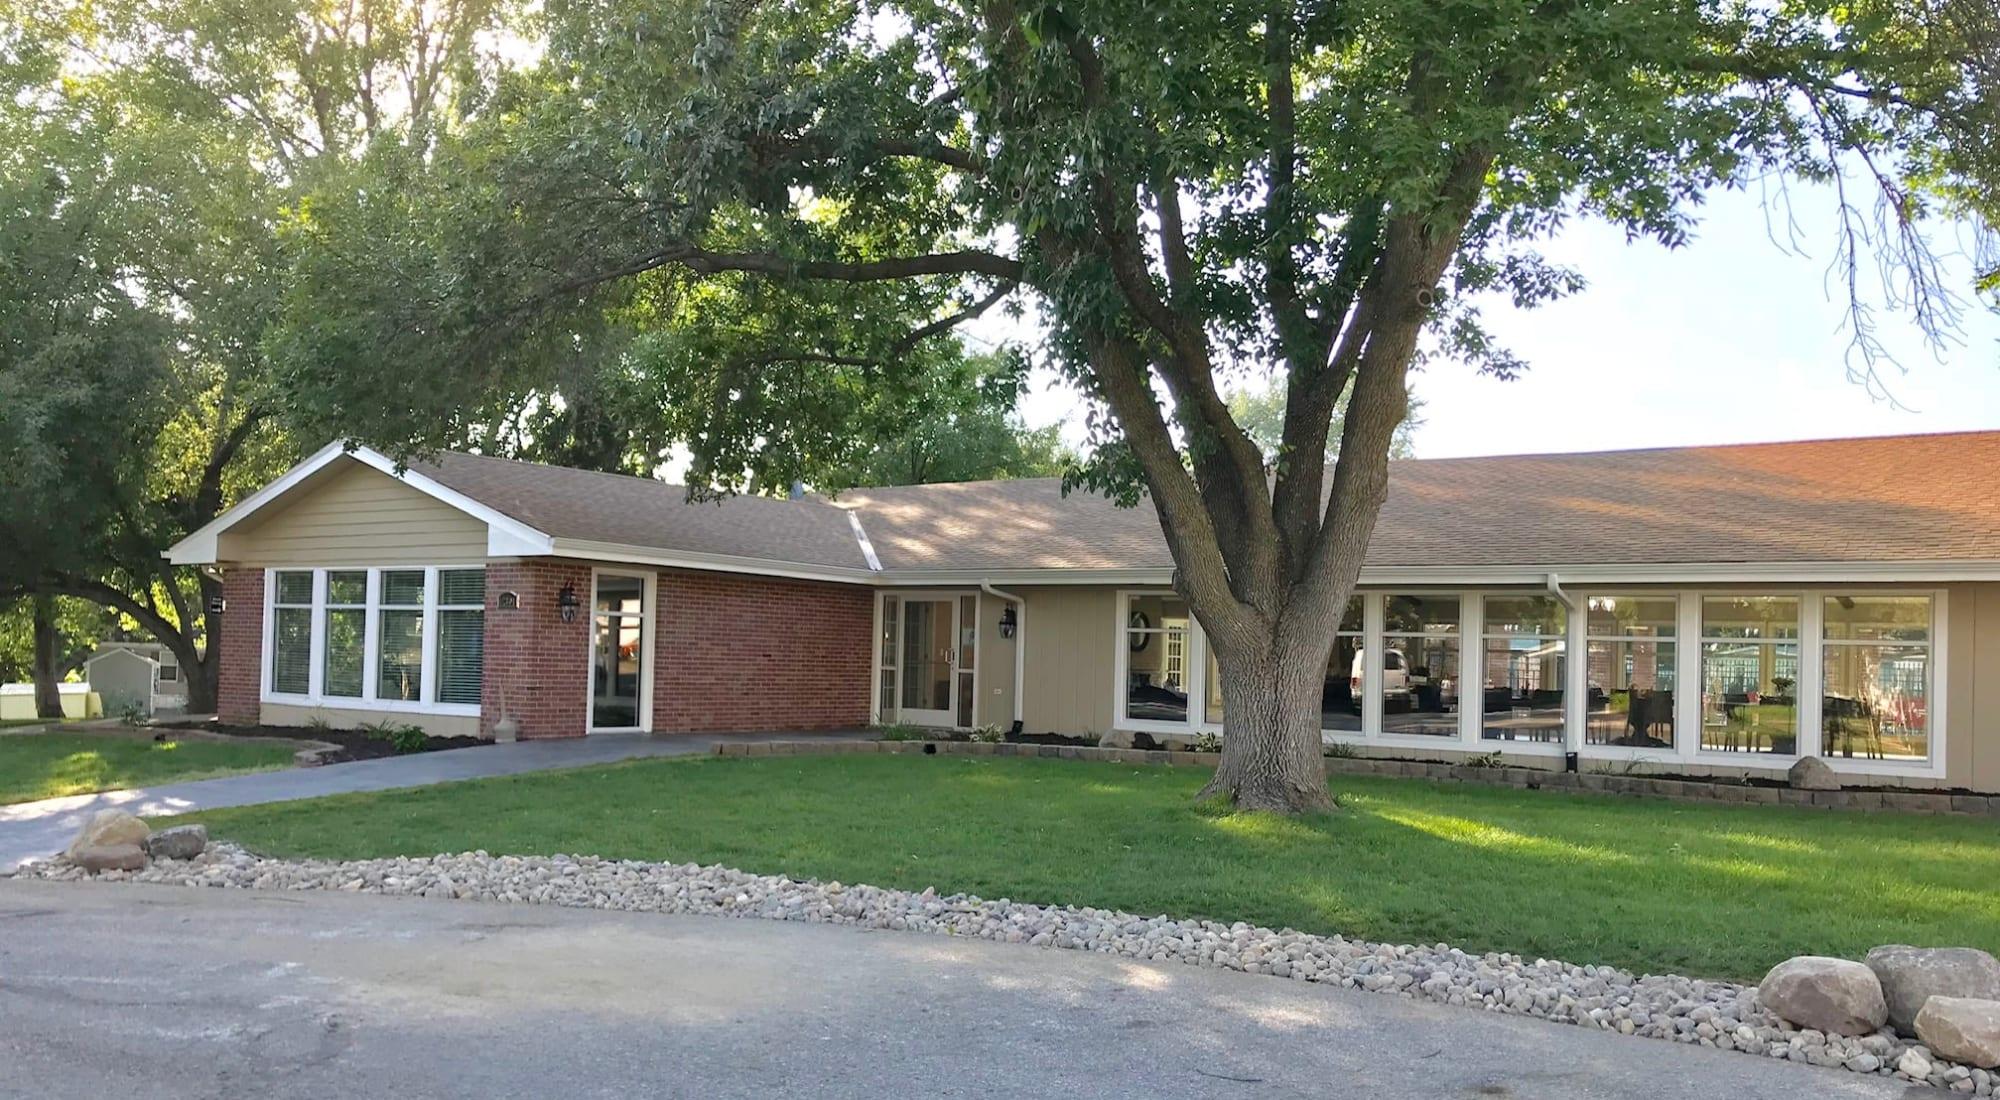 Mobile homes at Maplewood Estates in Omaha, Nebraska